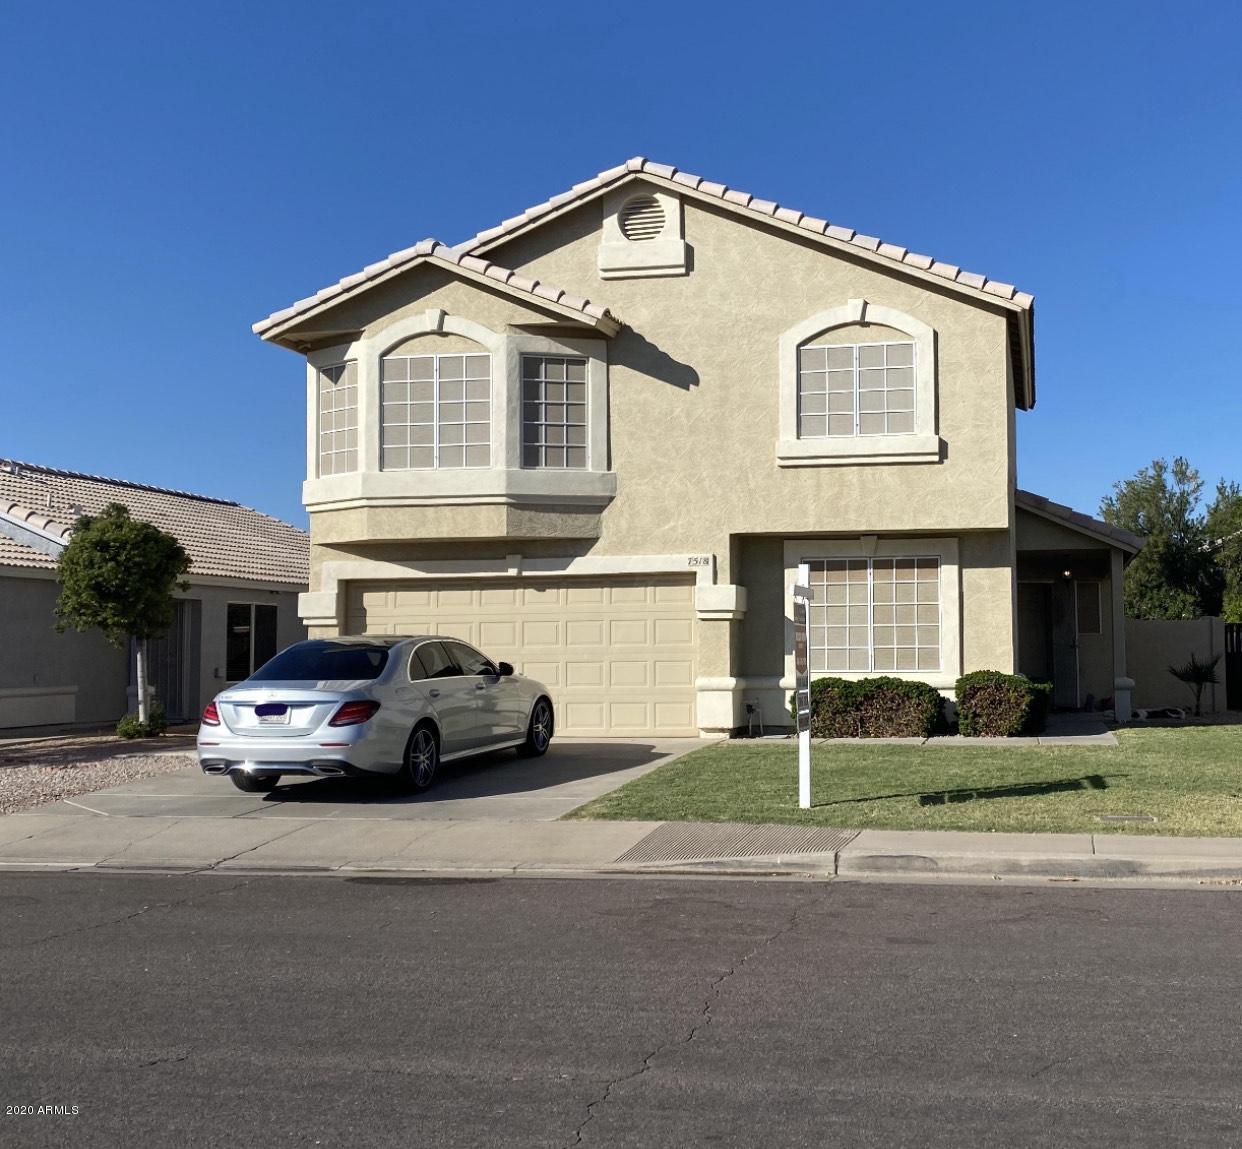 7518 NARANJA Avenue, Mesa, Arizona 85209, 3 Bedrooms Bedrooms, ,2.5 BathroomsBathrooms,Residential,For Sale,NARANJA,6153262